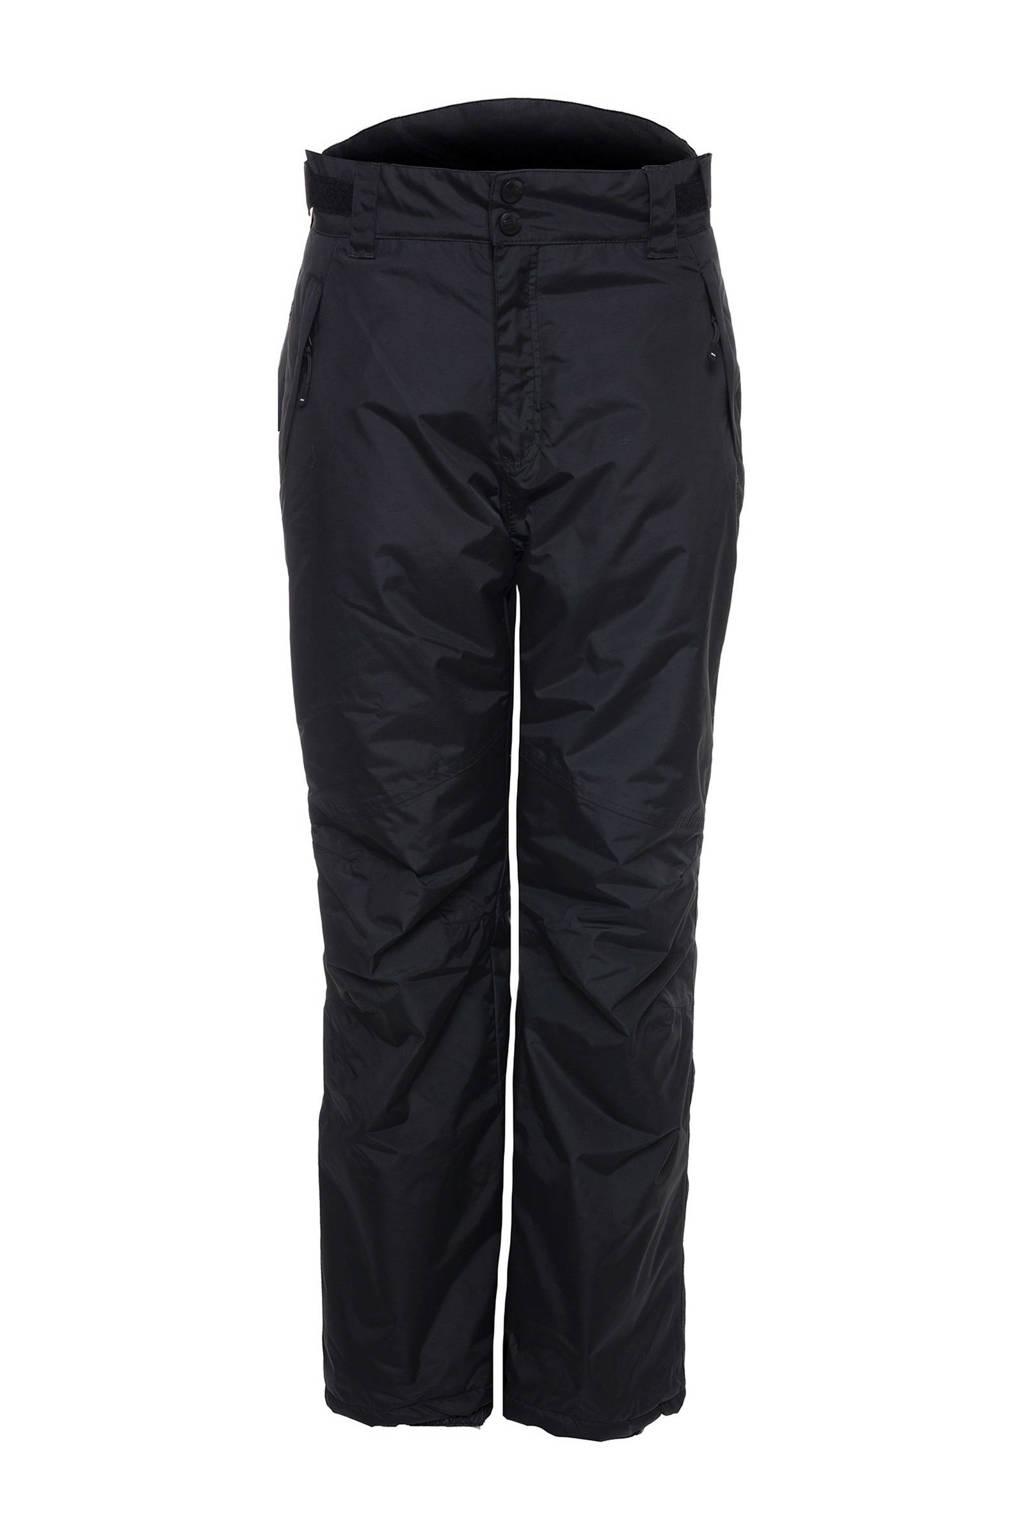 Mountain Peak skibroek  zwart, Zwart